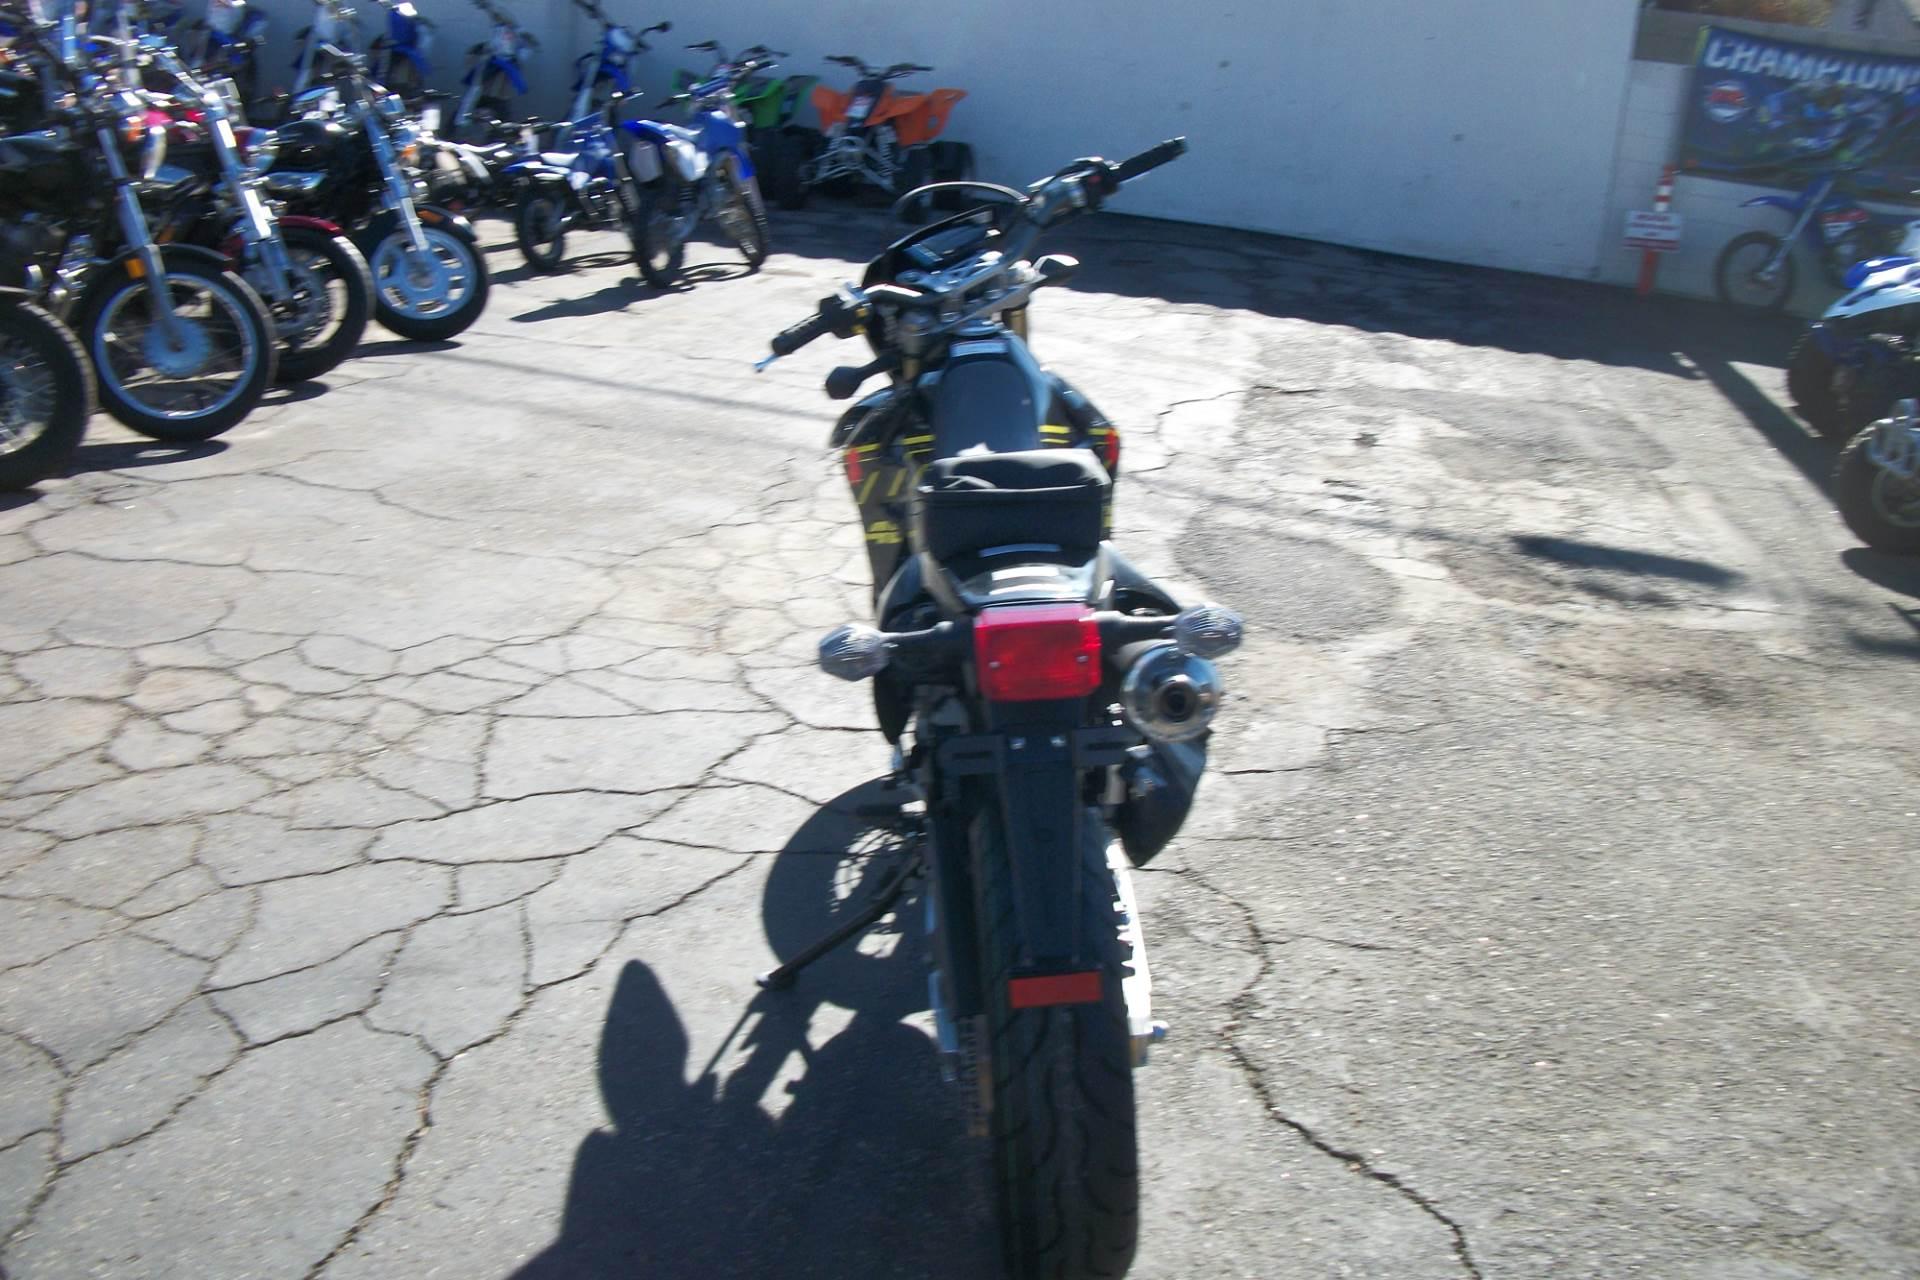 New 2018 Suzuki DR-Z400SM Motorcycles in Simi Valley, CA